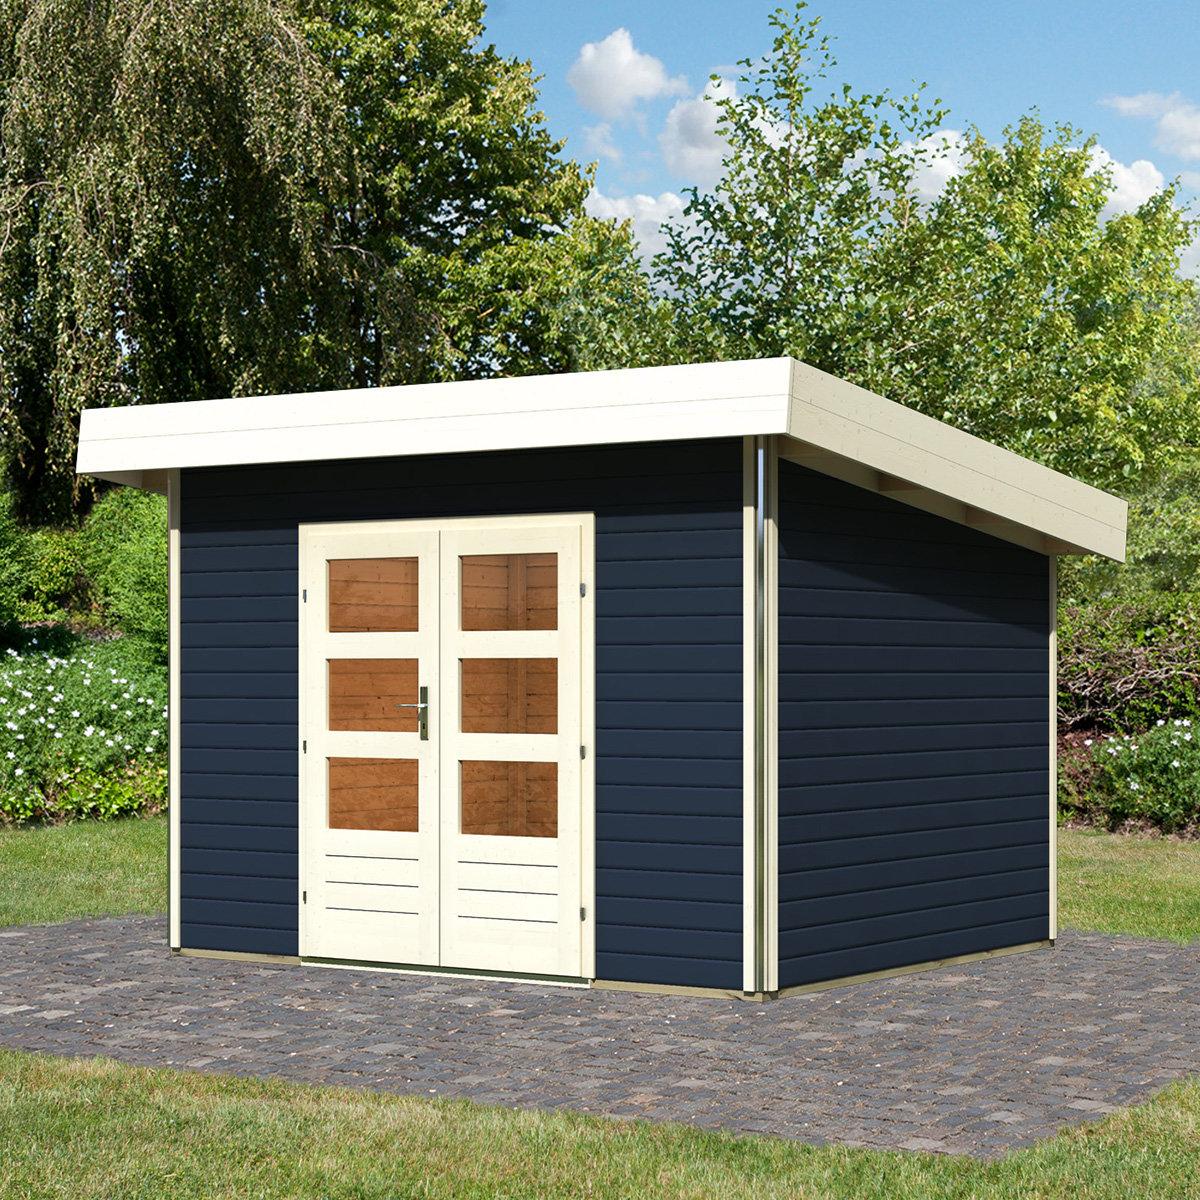 karibu gartenhaus moosburg 2 grau online kaufen bei g rtner p tschke. Black Bedroom Furniture Sets. Home Design Ideas